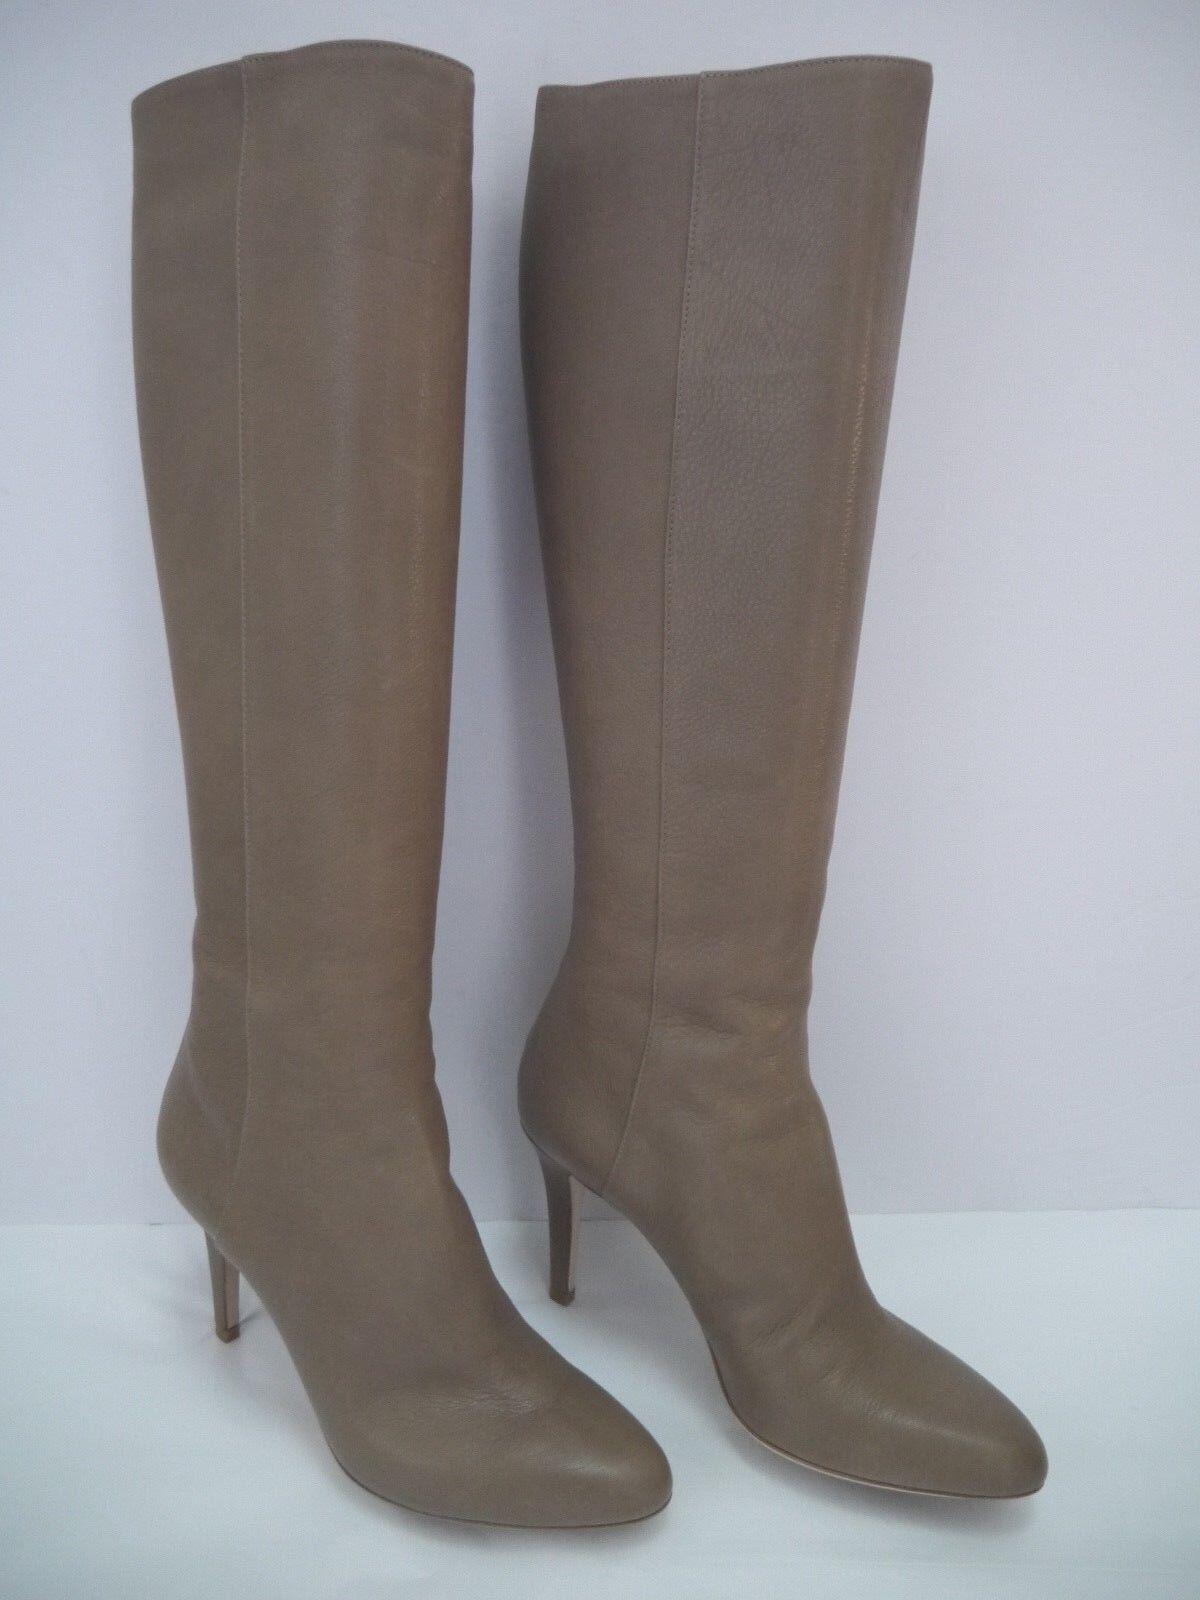 Nuova lista NEW JIMMY CHOO CHOO CHOO  1125 Grand taupe leather knee high heeled stivali Italian Dimensione 37  Spedizione gratuita al 100%